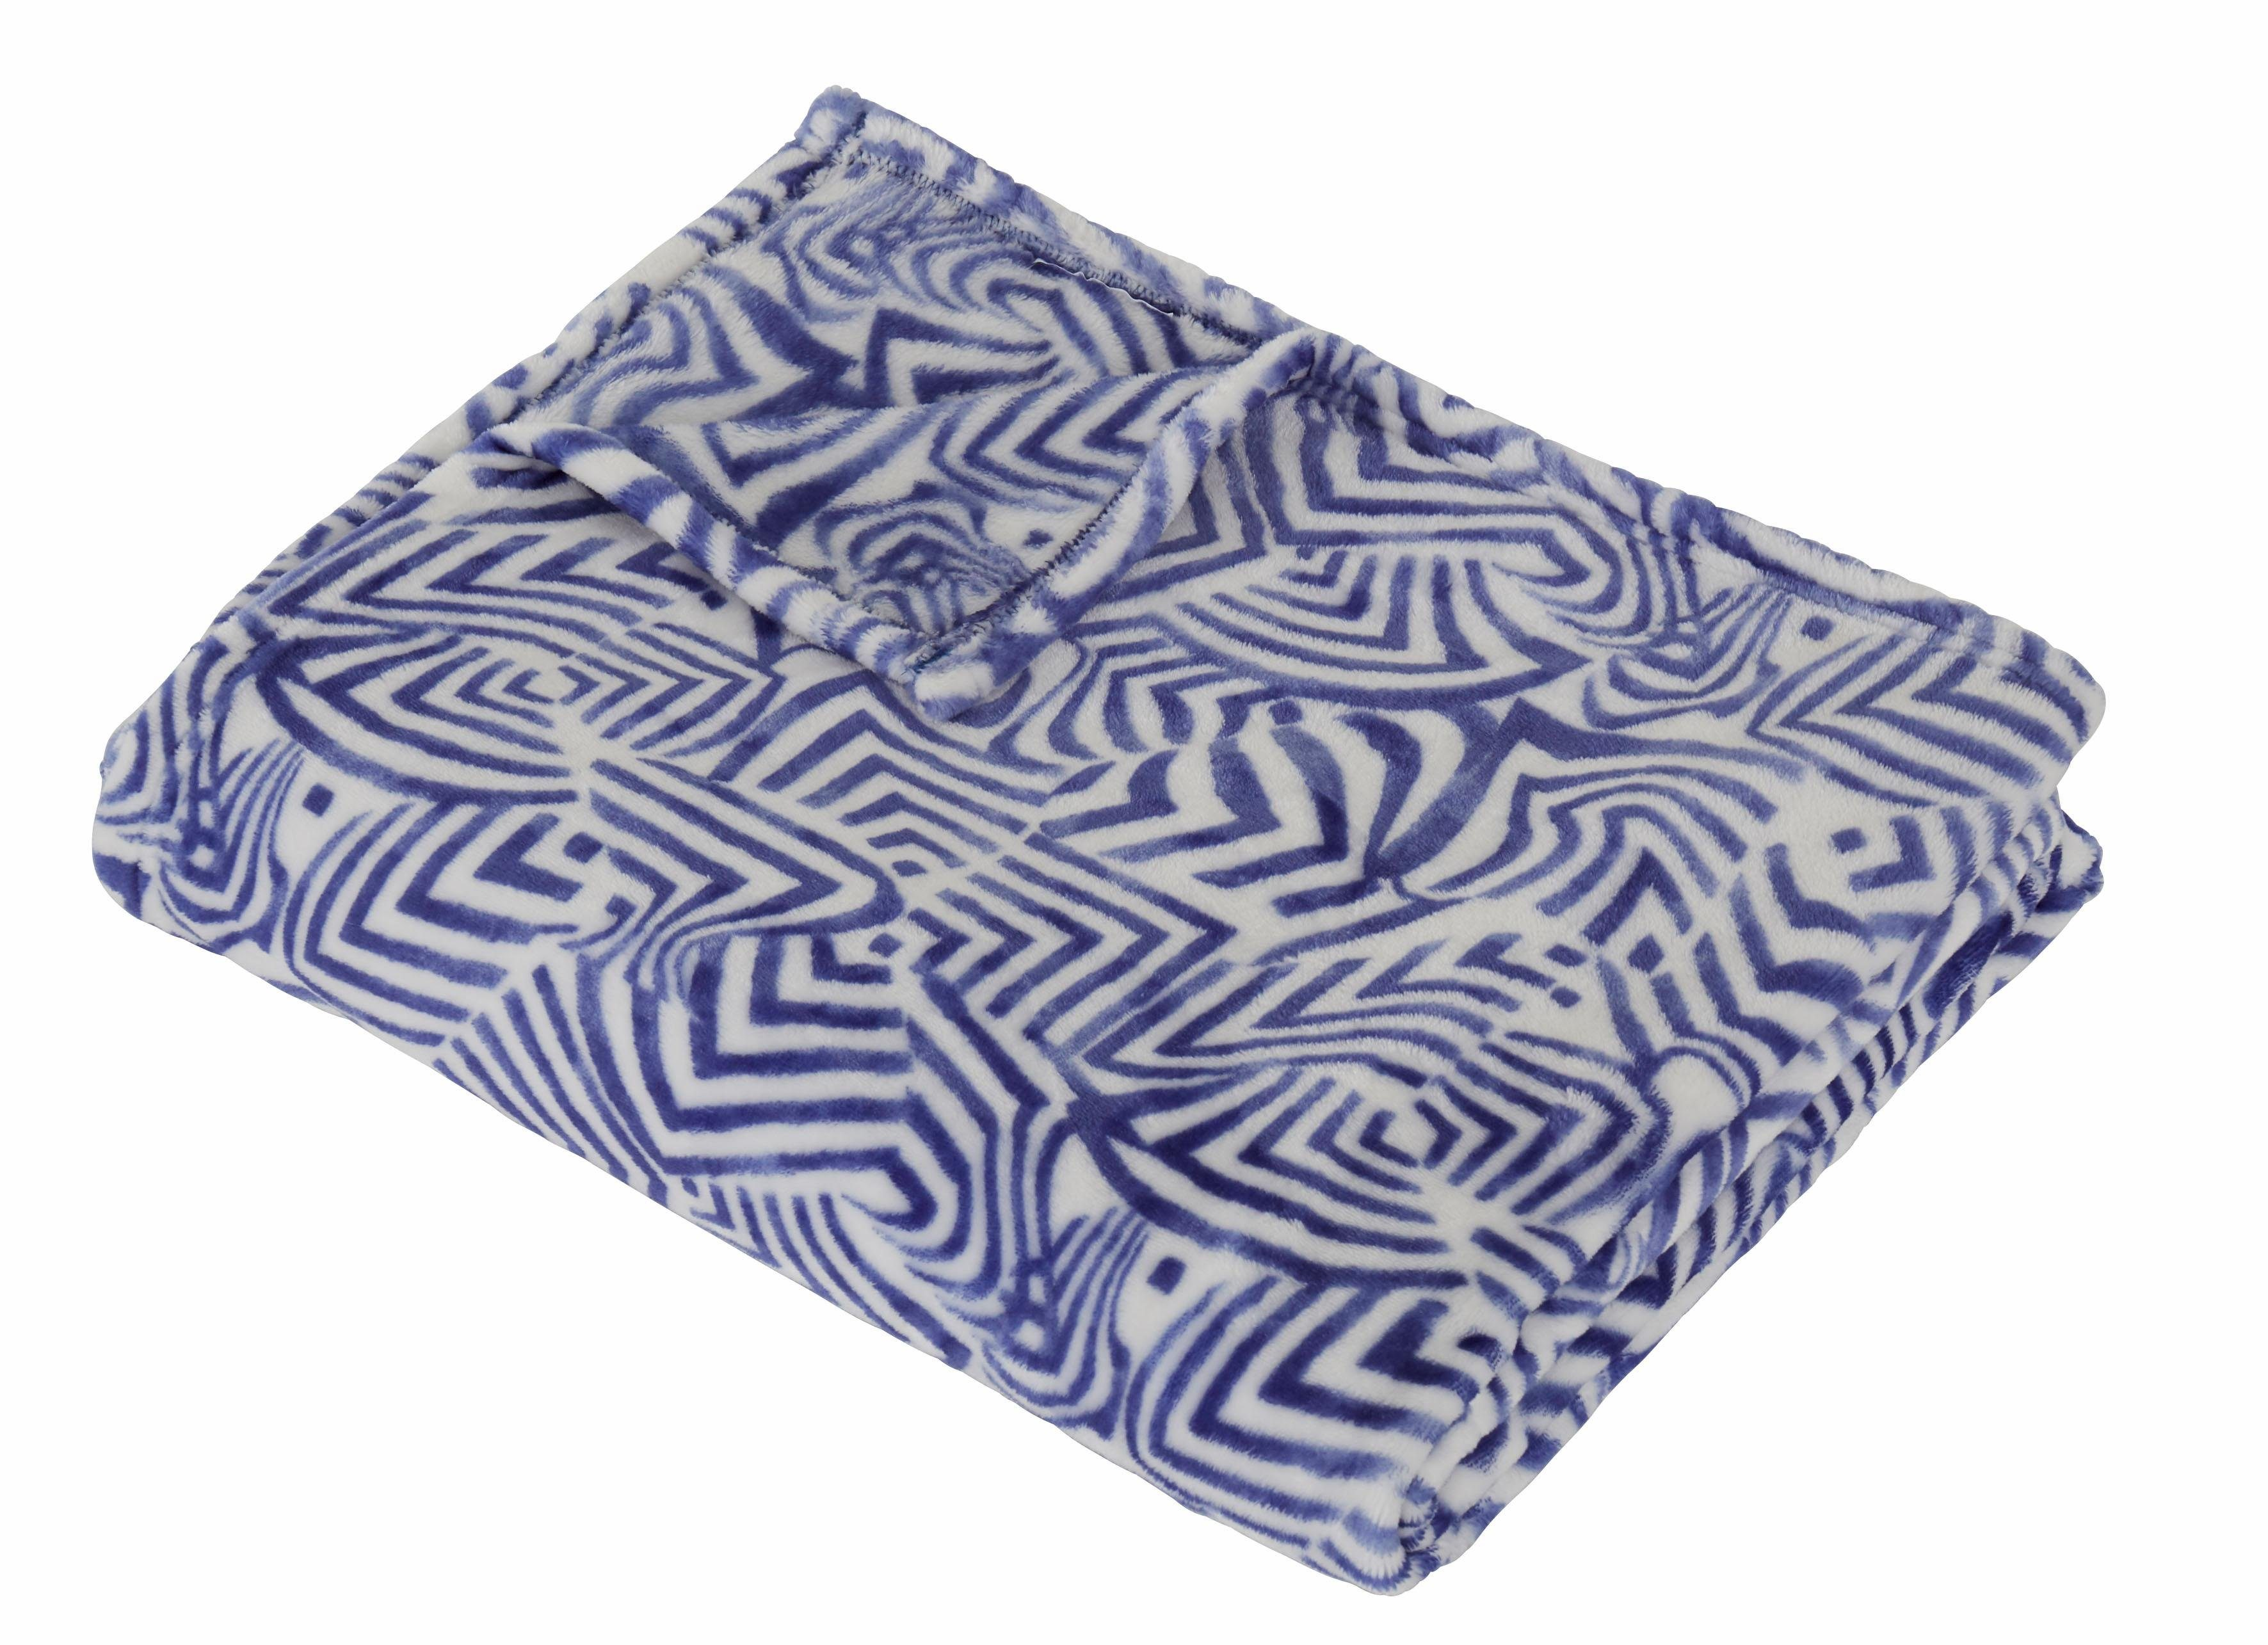 Wohndecke »Blue waves«, Guido Maria Kretschmer Home&Living, mit modernem Muster